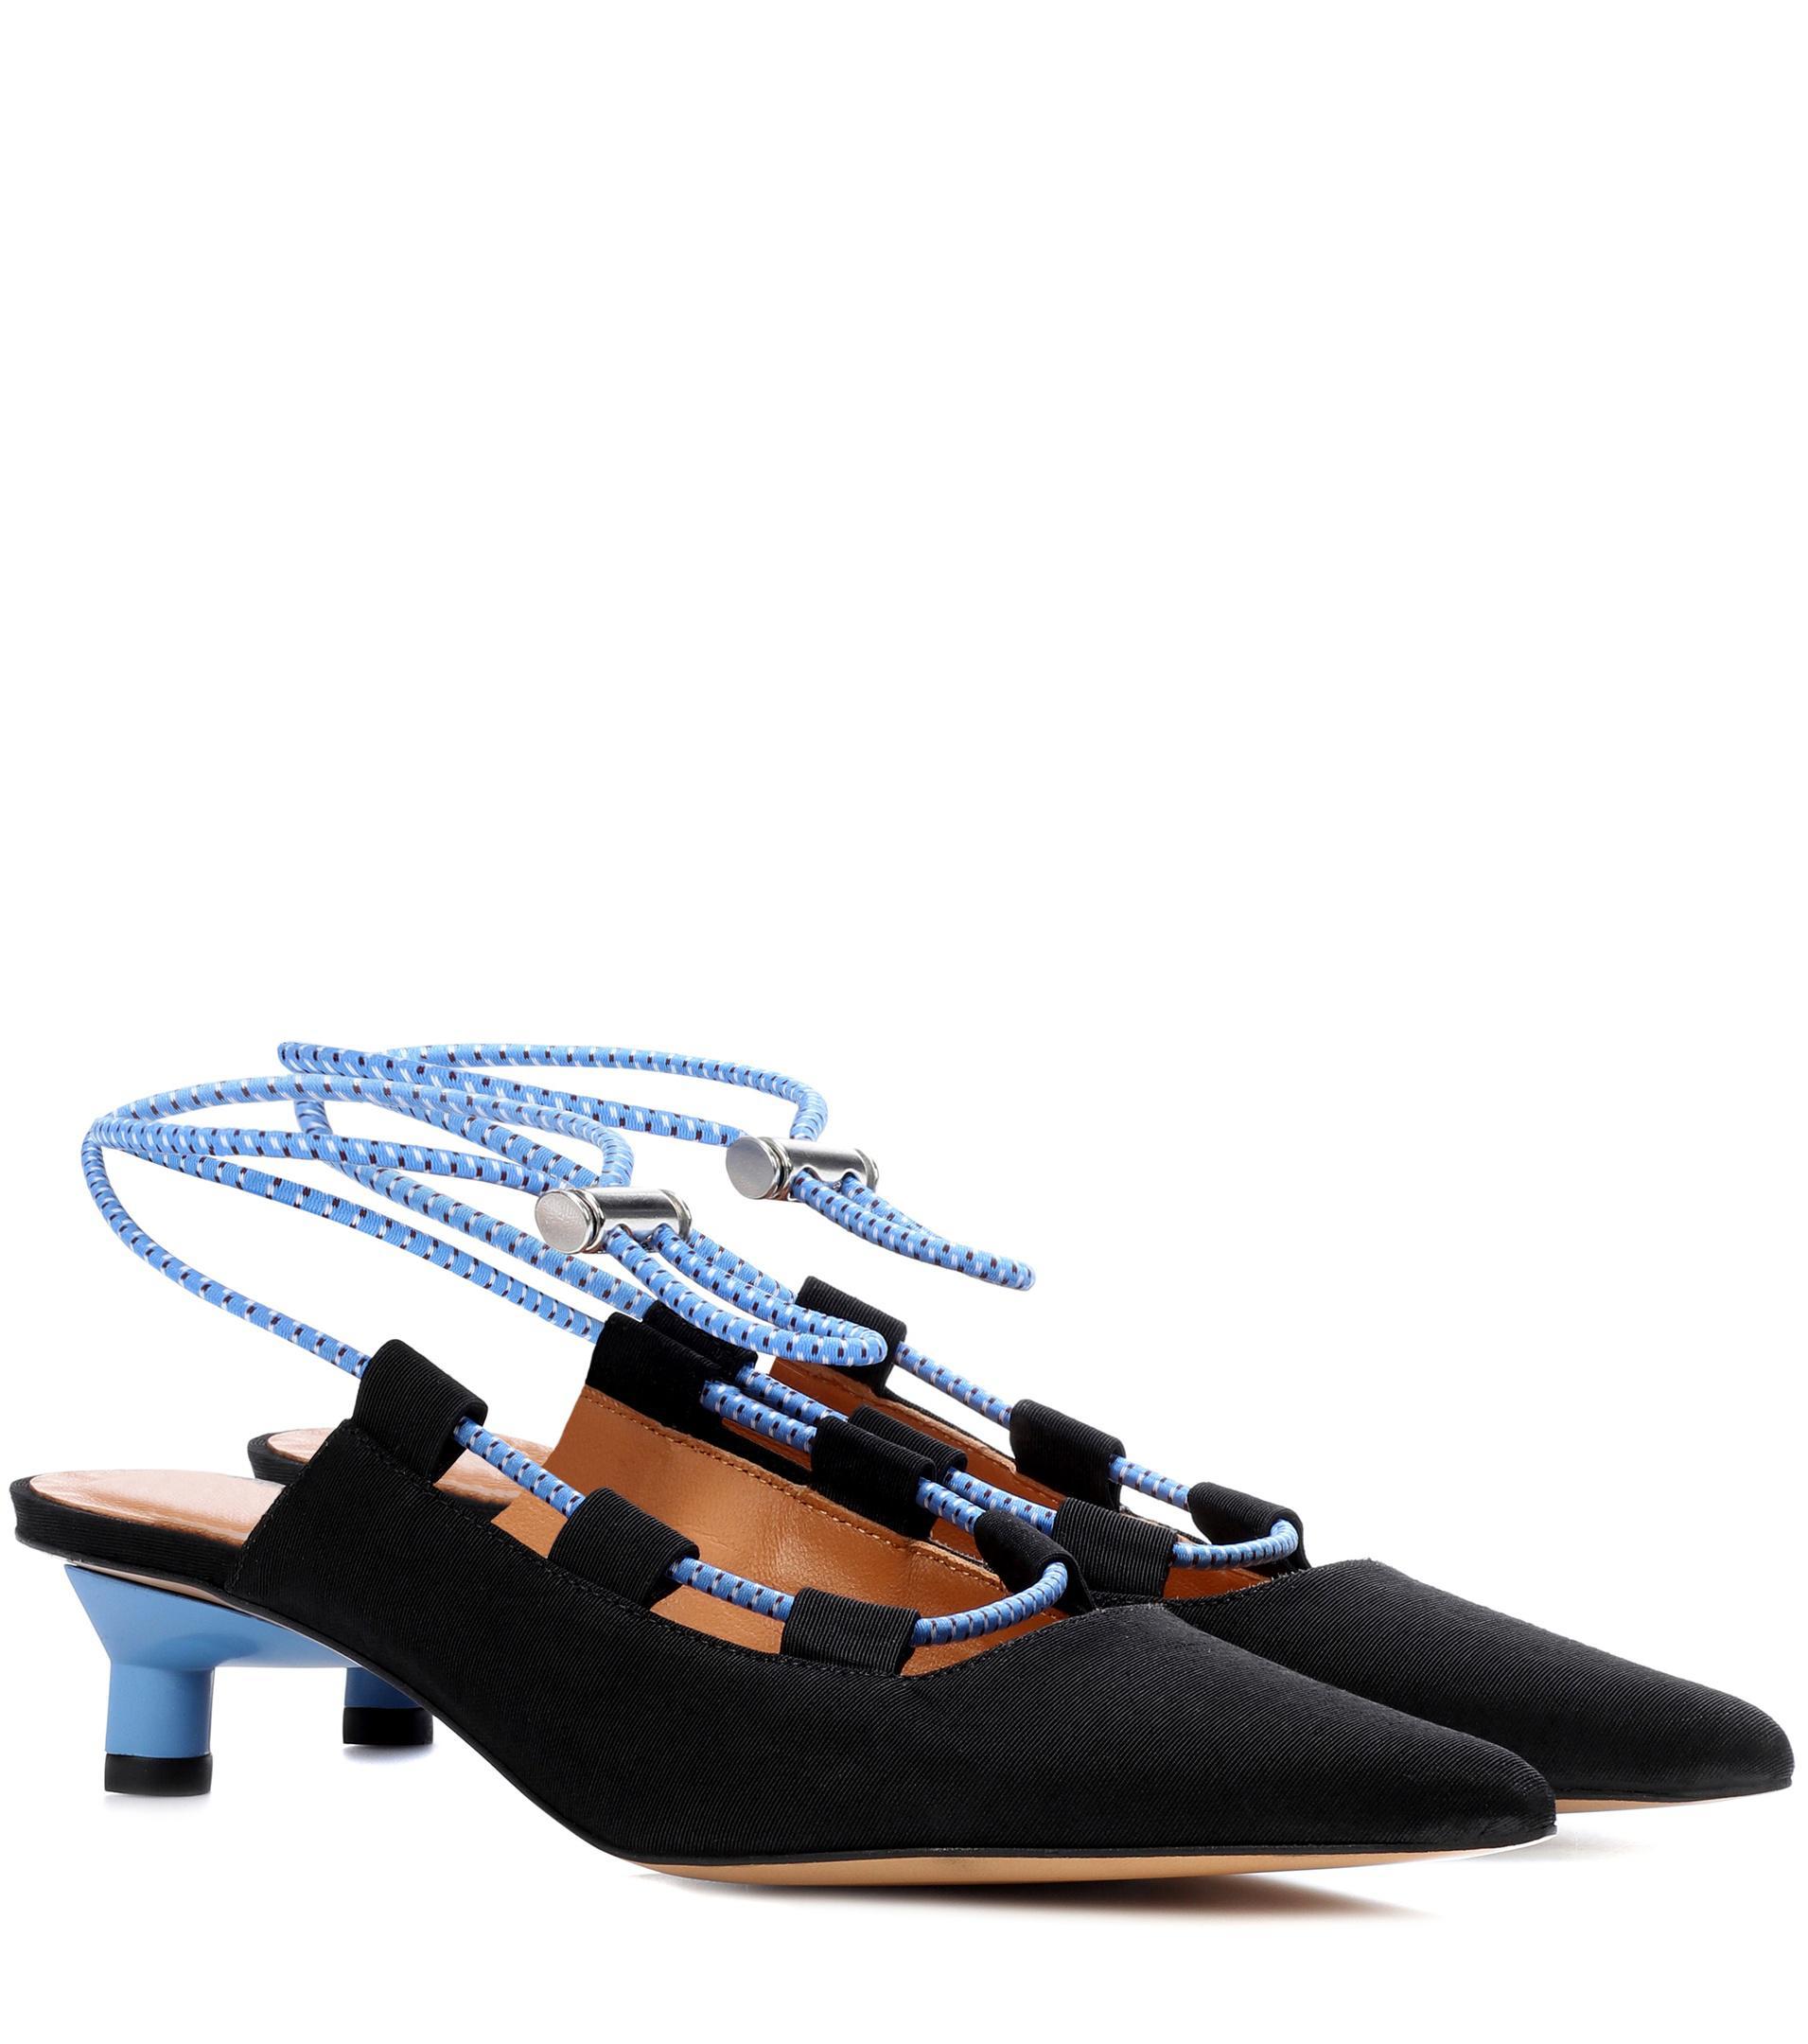 Ganni Drawstring ankle-strap pumps